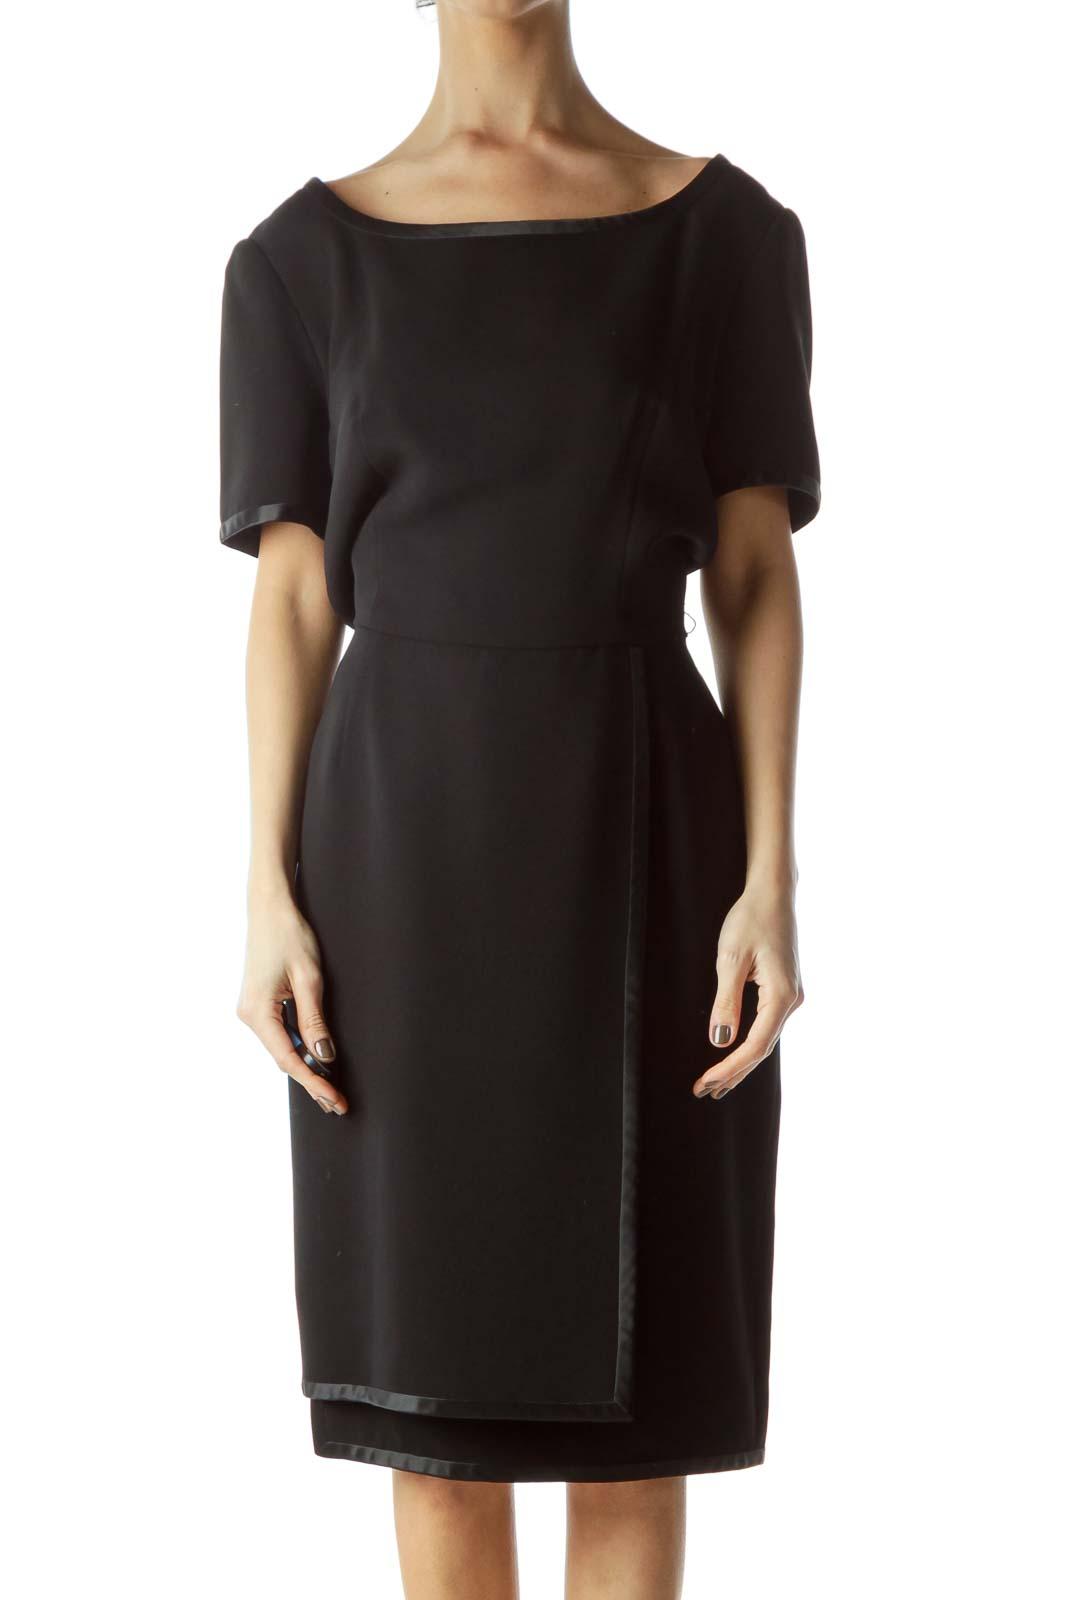 Black Short Sleeve Dress Front